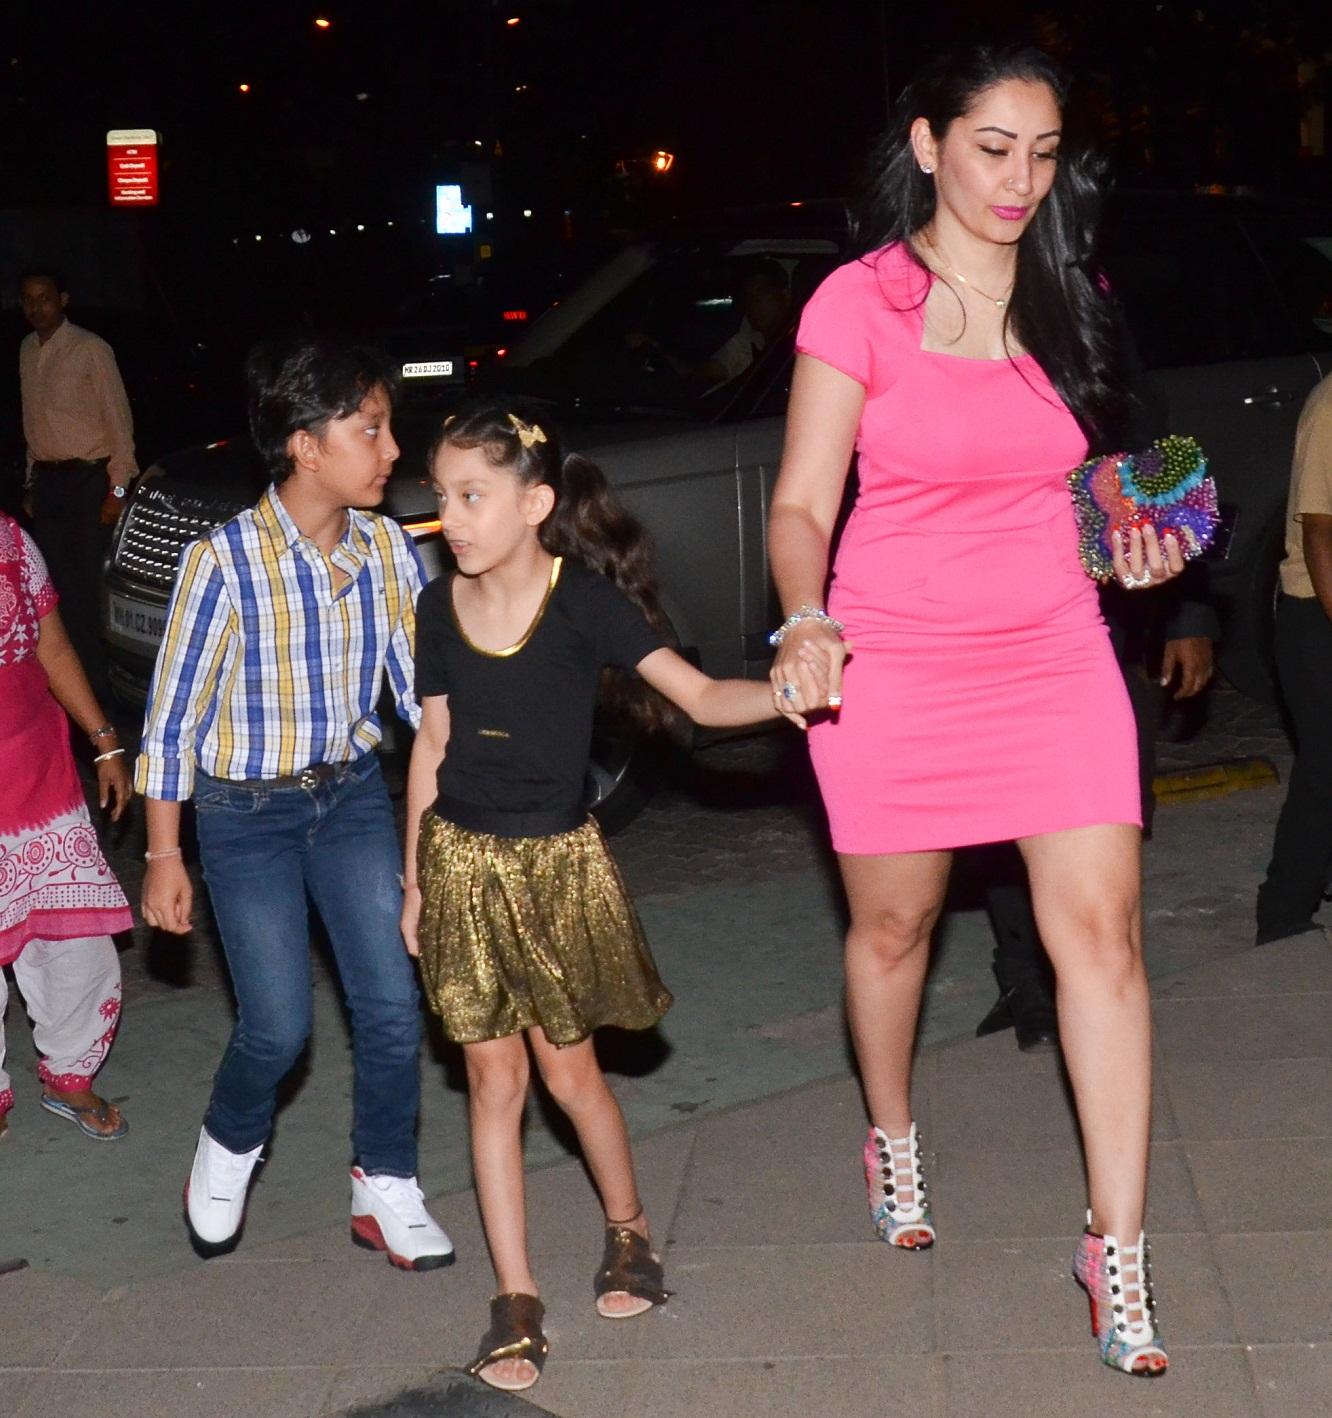 Bollywood Tadka, मान्यता दत्त इमेज, मान्यता दत्त फोटो, मान्यता दत्त पिक्चर, संजय दत्त इमेज, संजय दत्त फोटो, संजय दत्त पिक्चर,